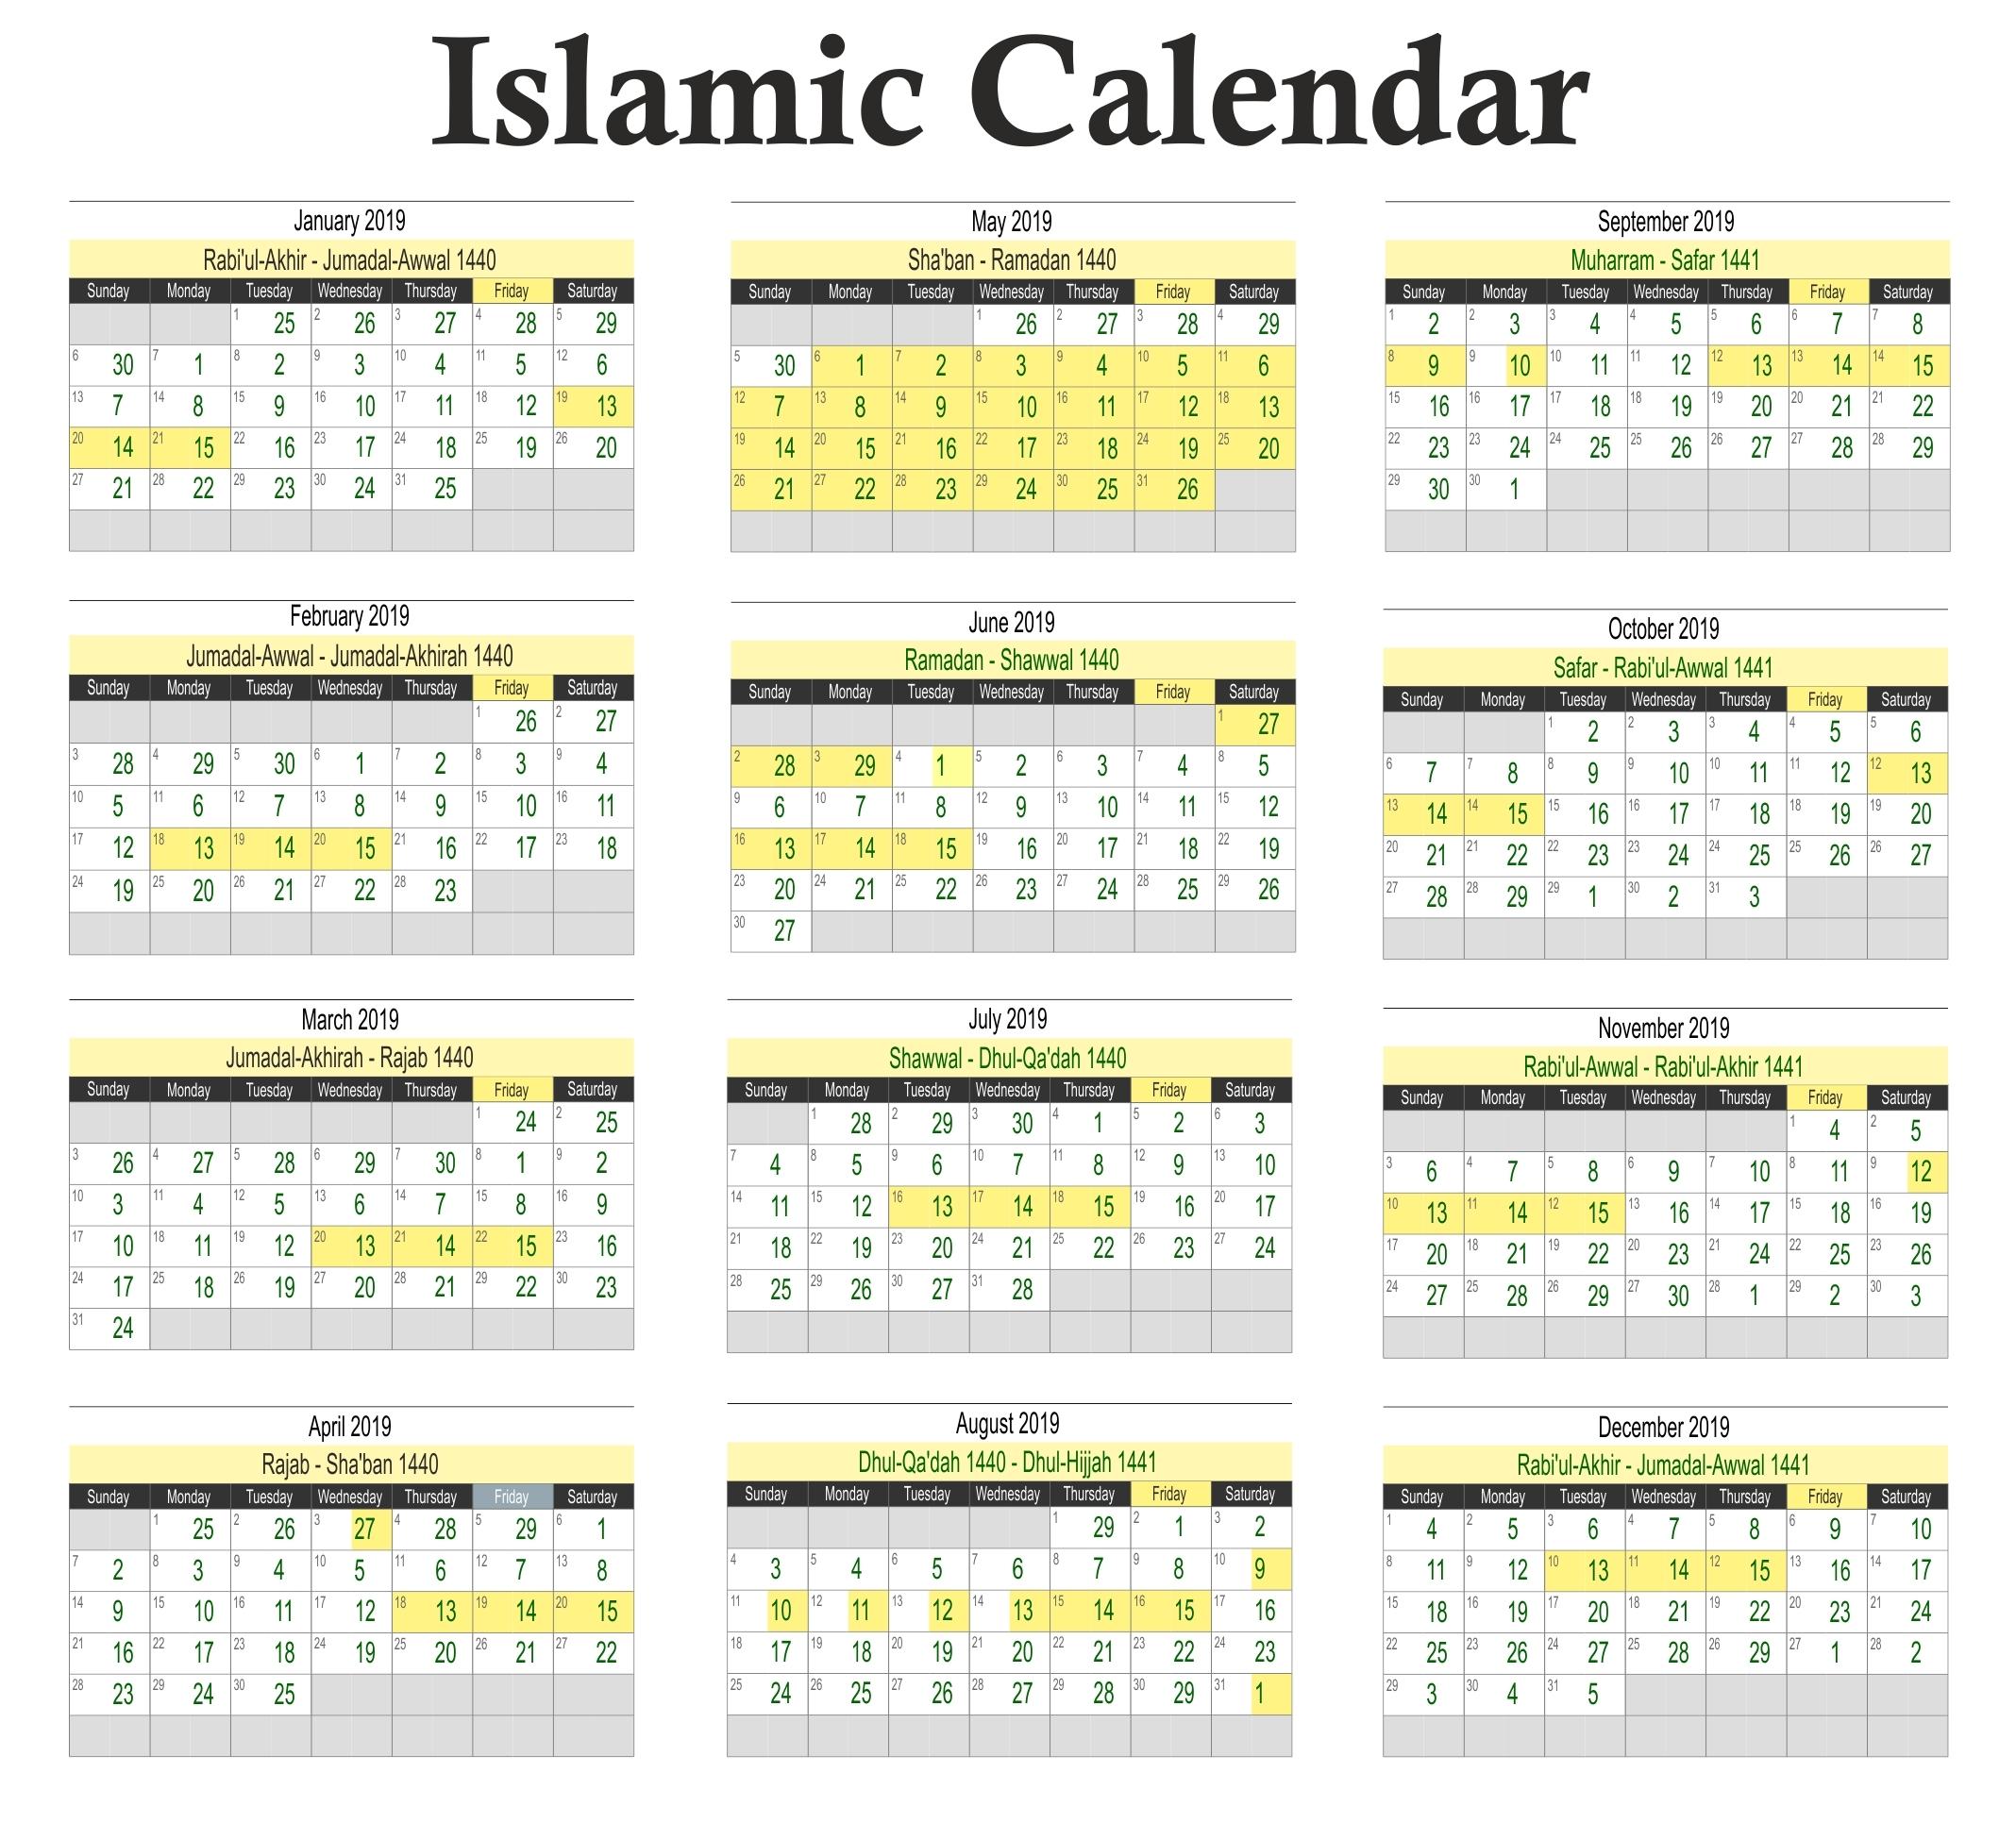 Calendar Muslim Holidays 2019 • Printable Blank Calendar-2020 Calendar Muslim Holidays